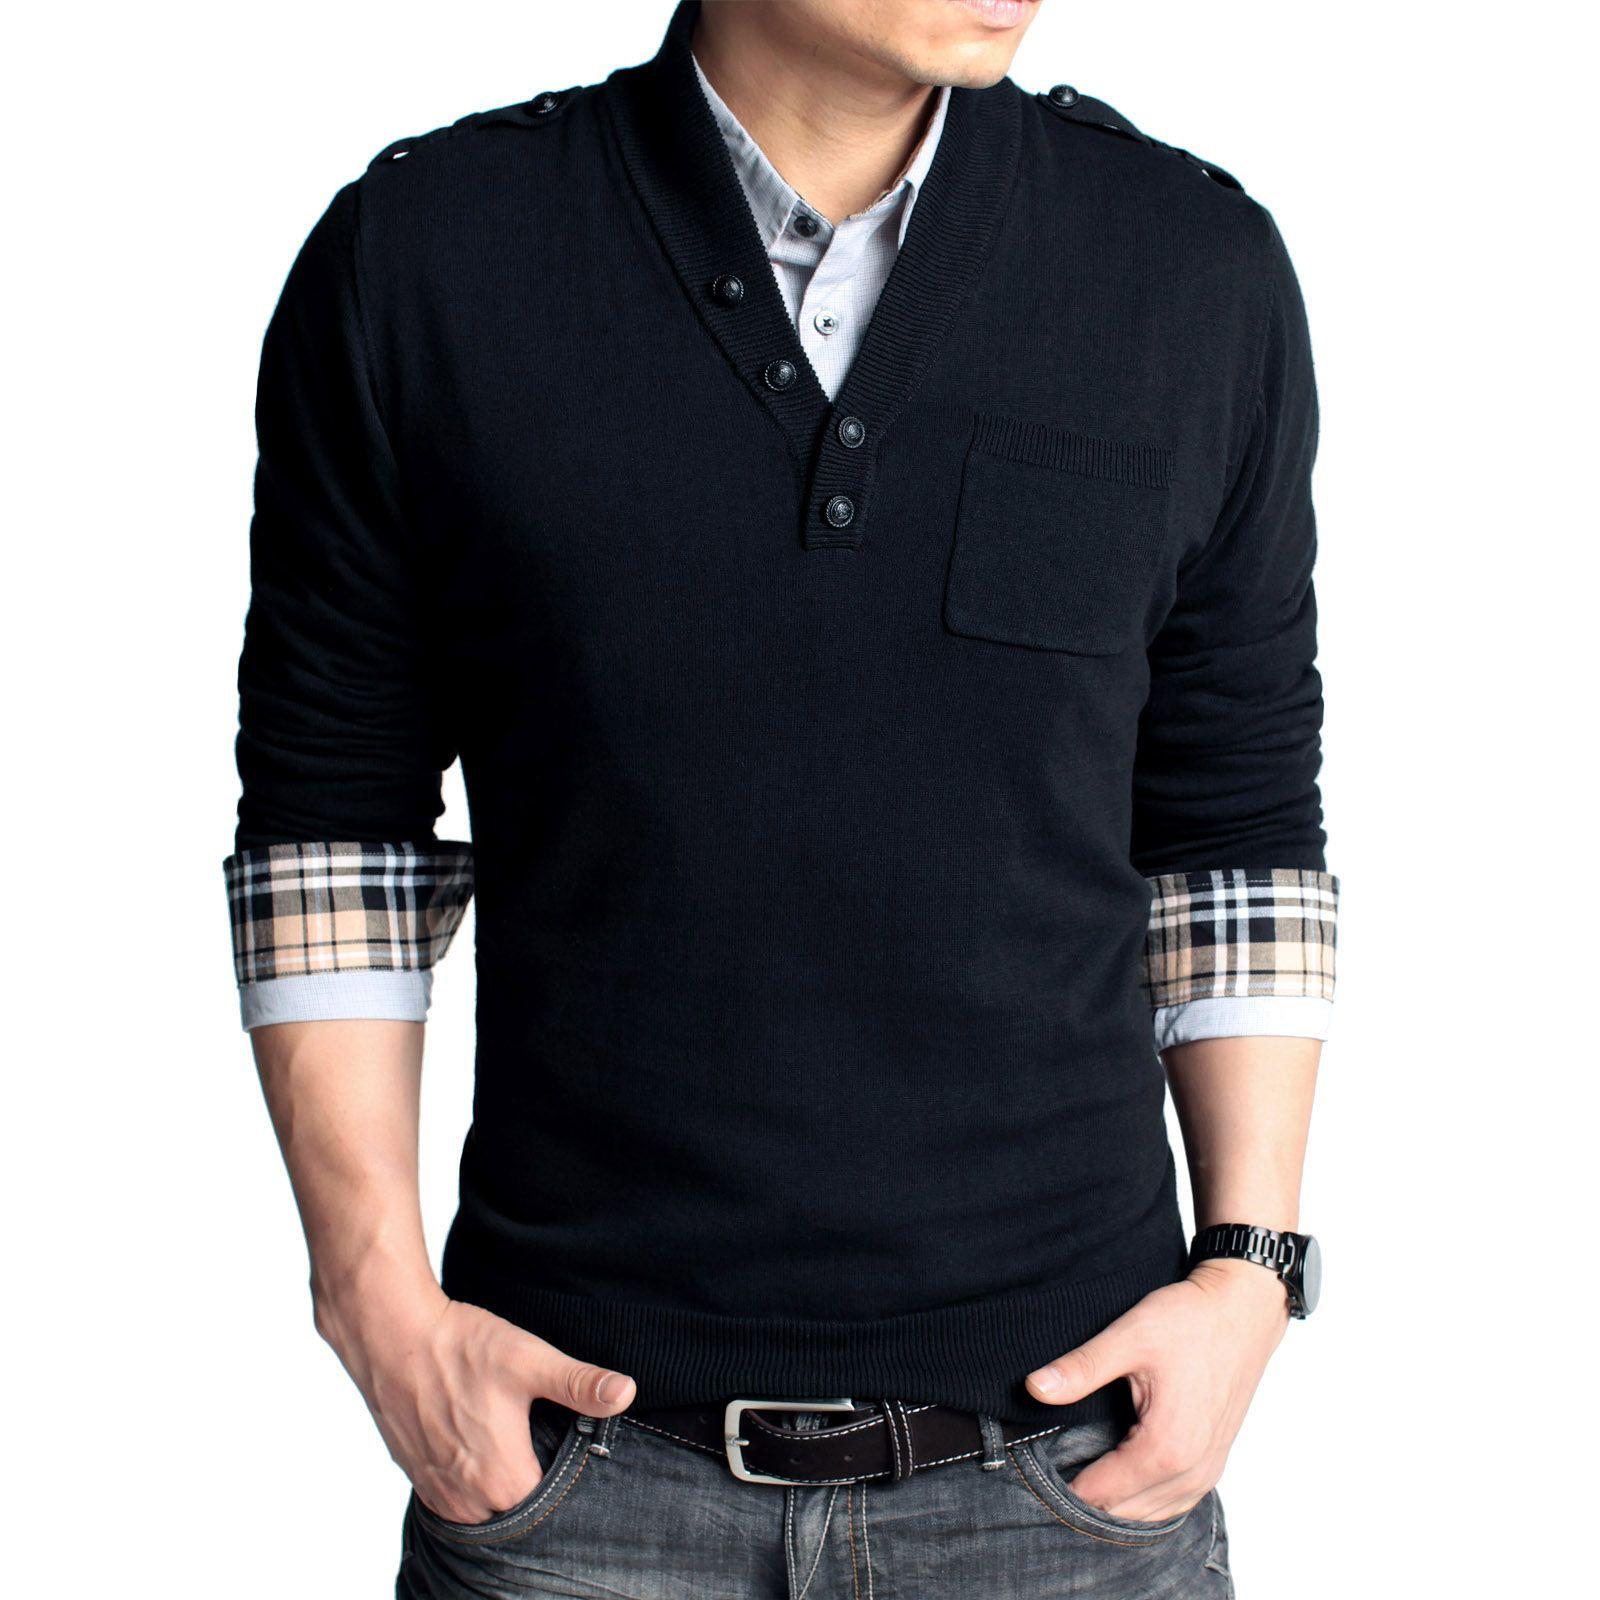 Casual menu0026#39;s fashion | menu0026#39;s v-neck sweater simple fashion korean slim personalized button ...